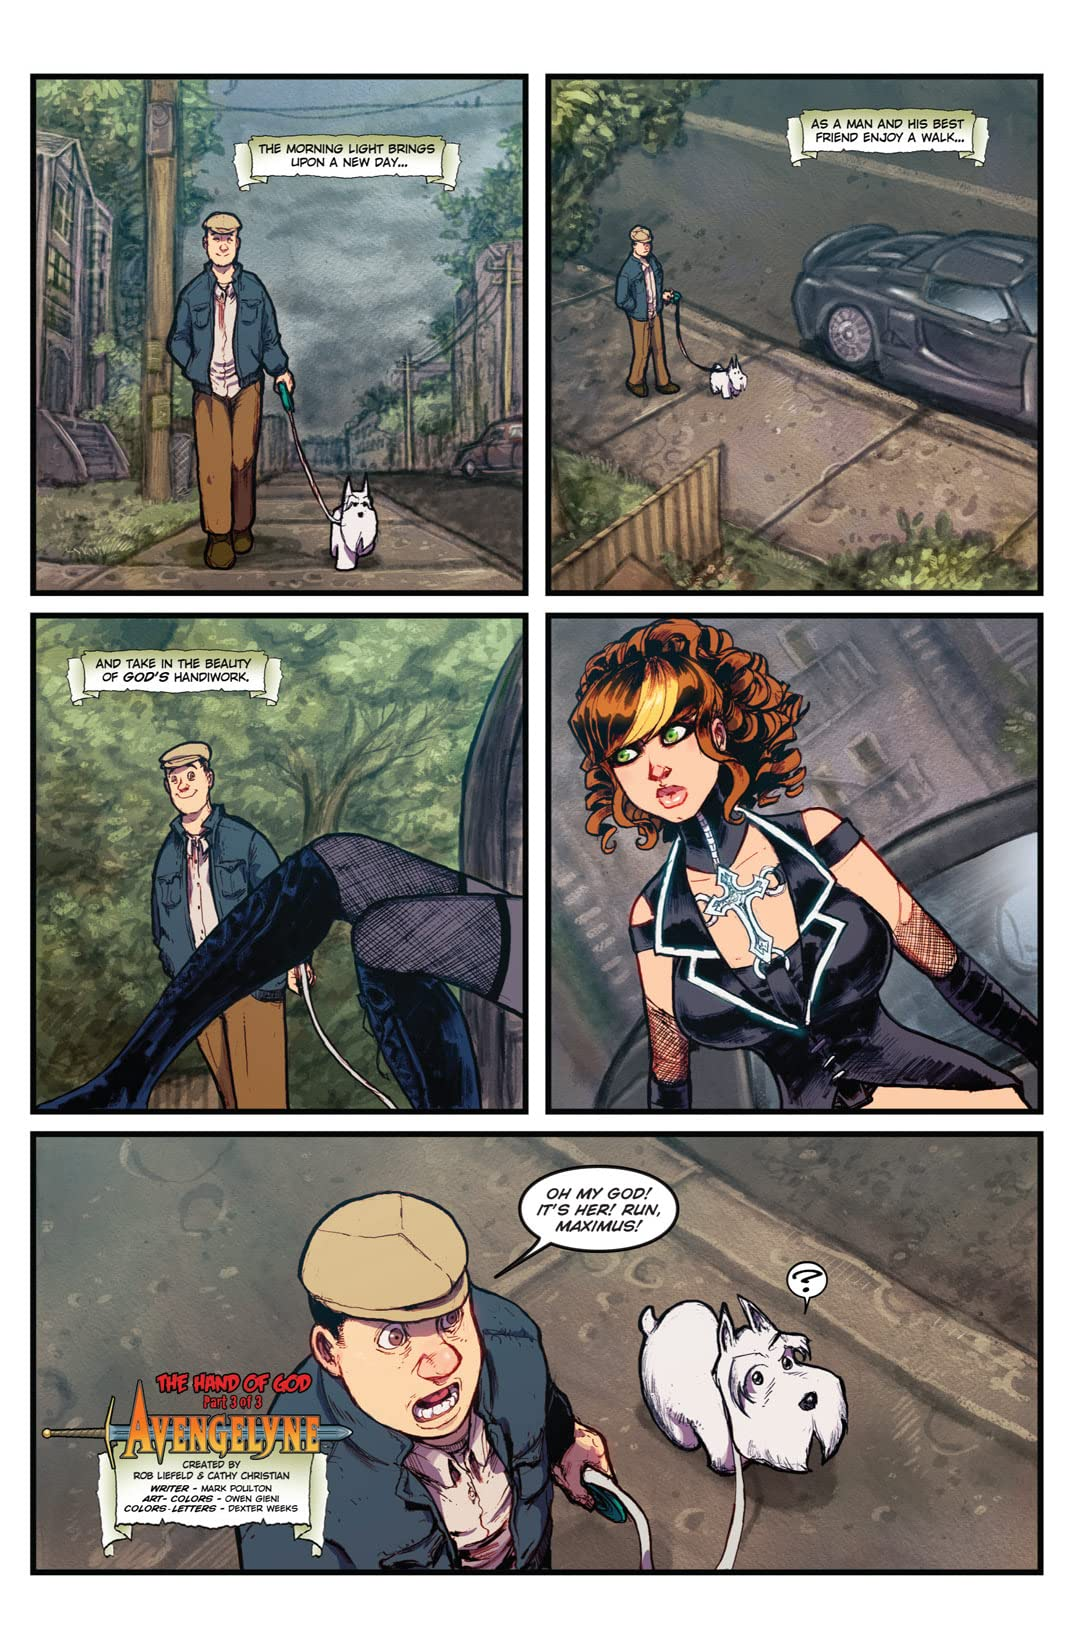 Avengelyne #6